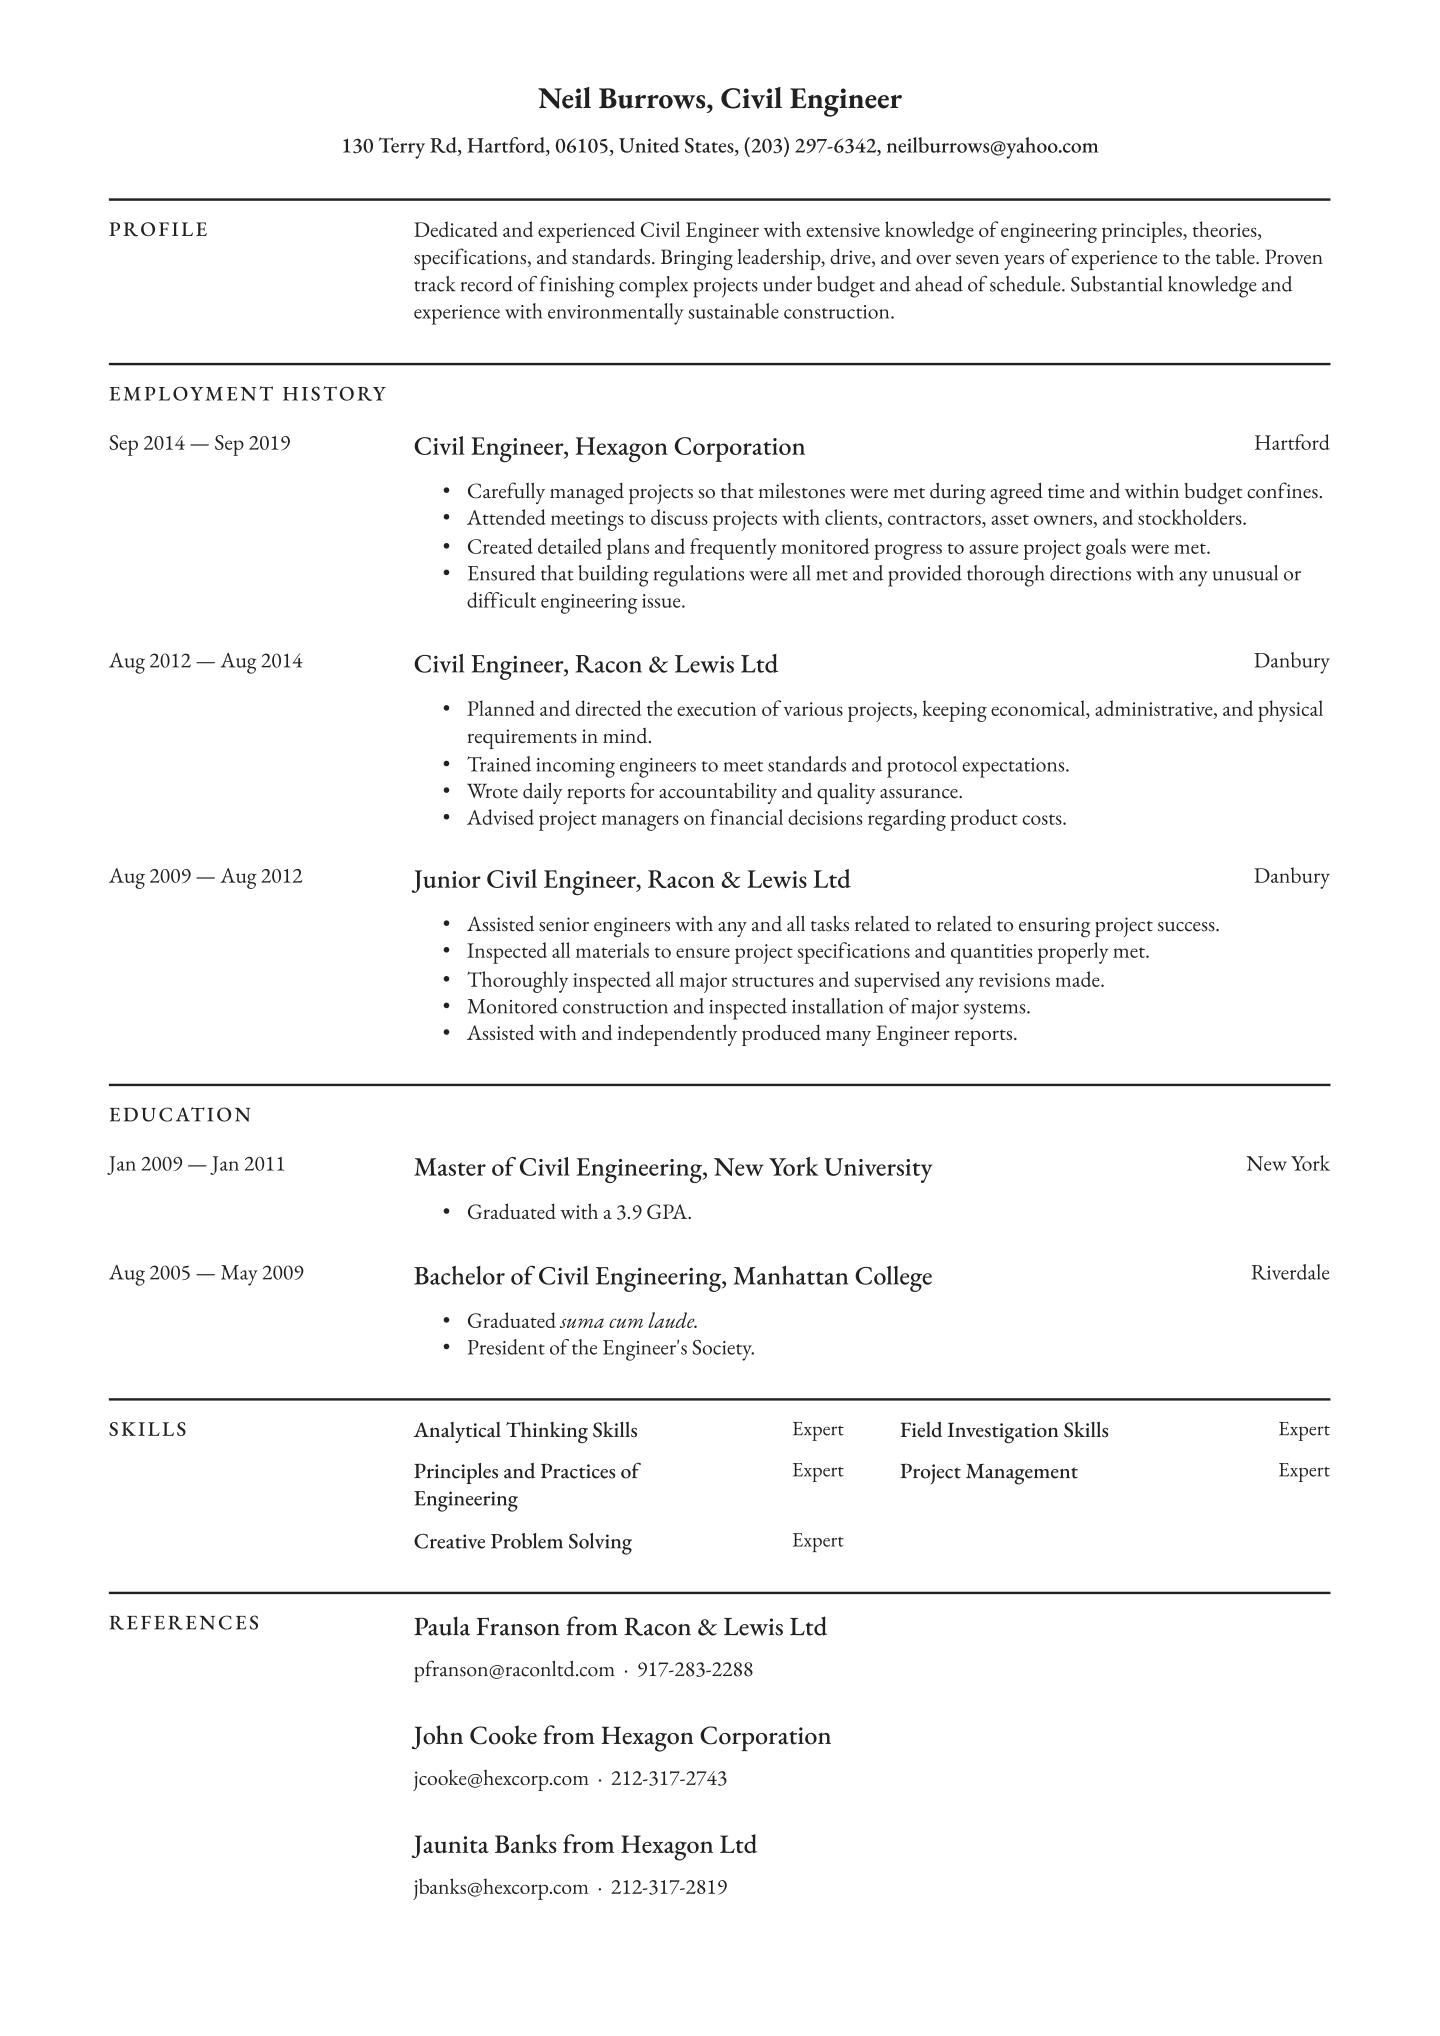 Civil Engineer Resume Example